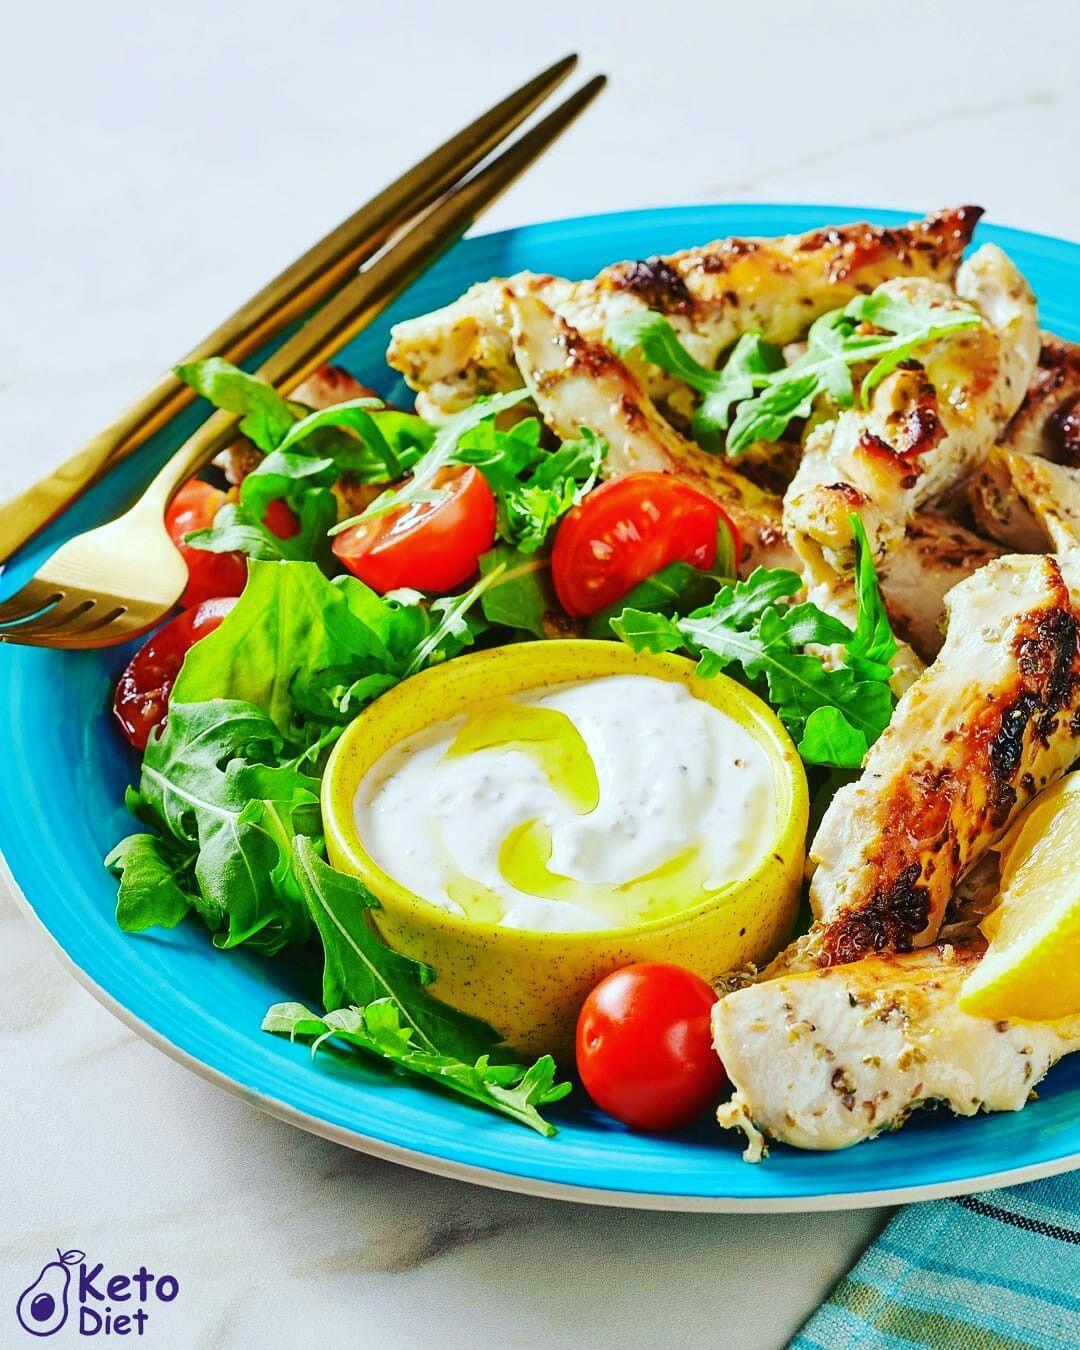 Free Keto Diet Cookbook Keto Diet Keto Recipes Easy Keto Meal Plan